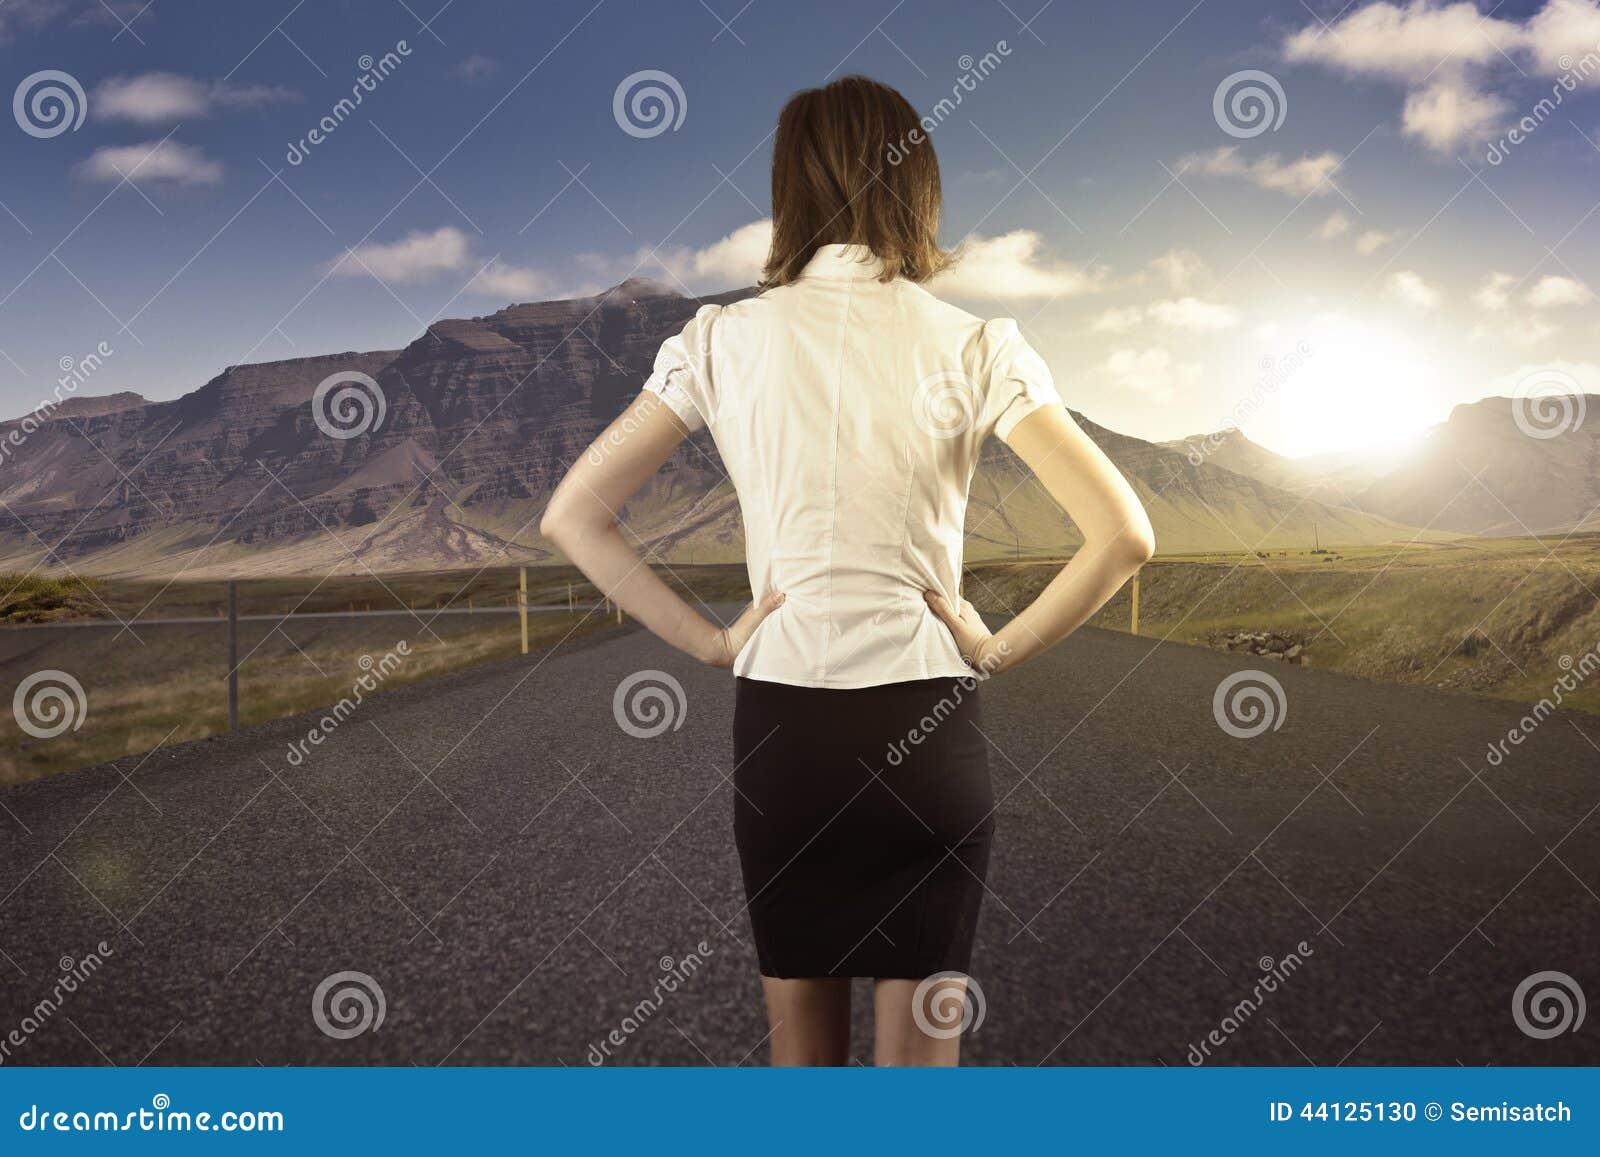 Traveling inward journey as metaphor